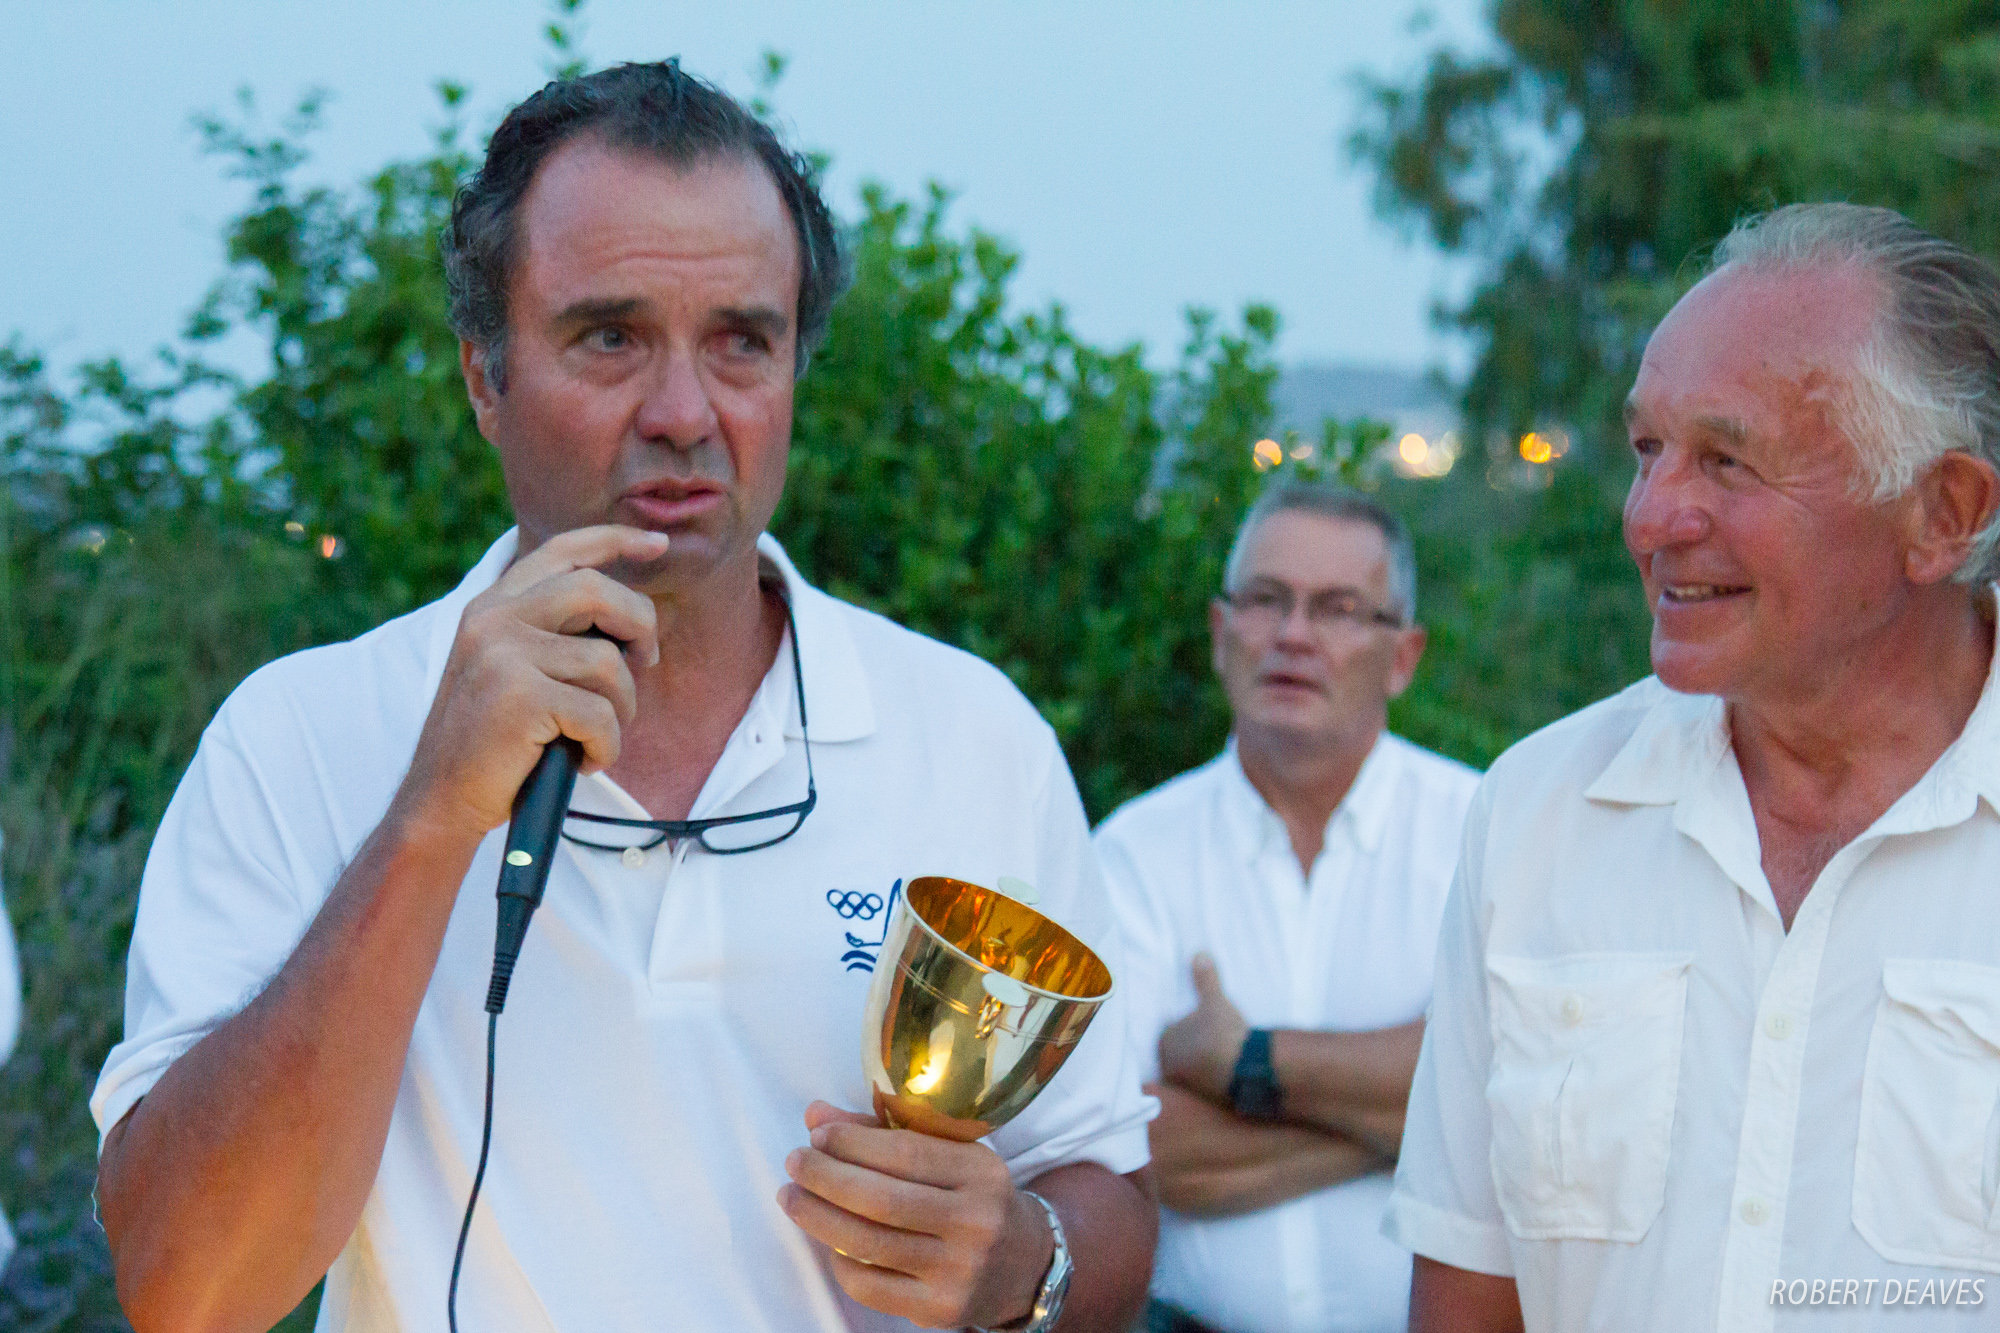 Joaquín Blanco receives the Finn Gold Cup from Finn Class President of Honour Gerardo Seeliger. Photo Robert Deaves.